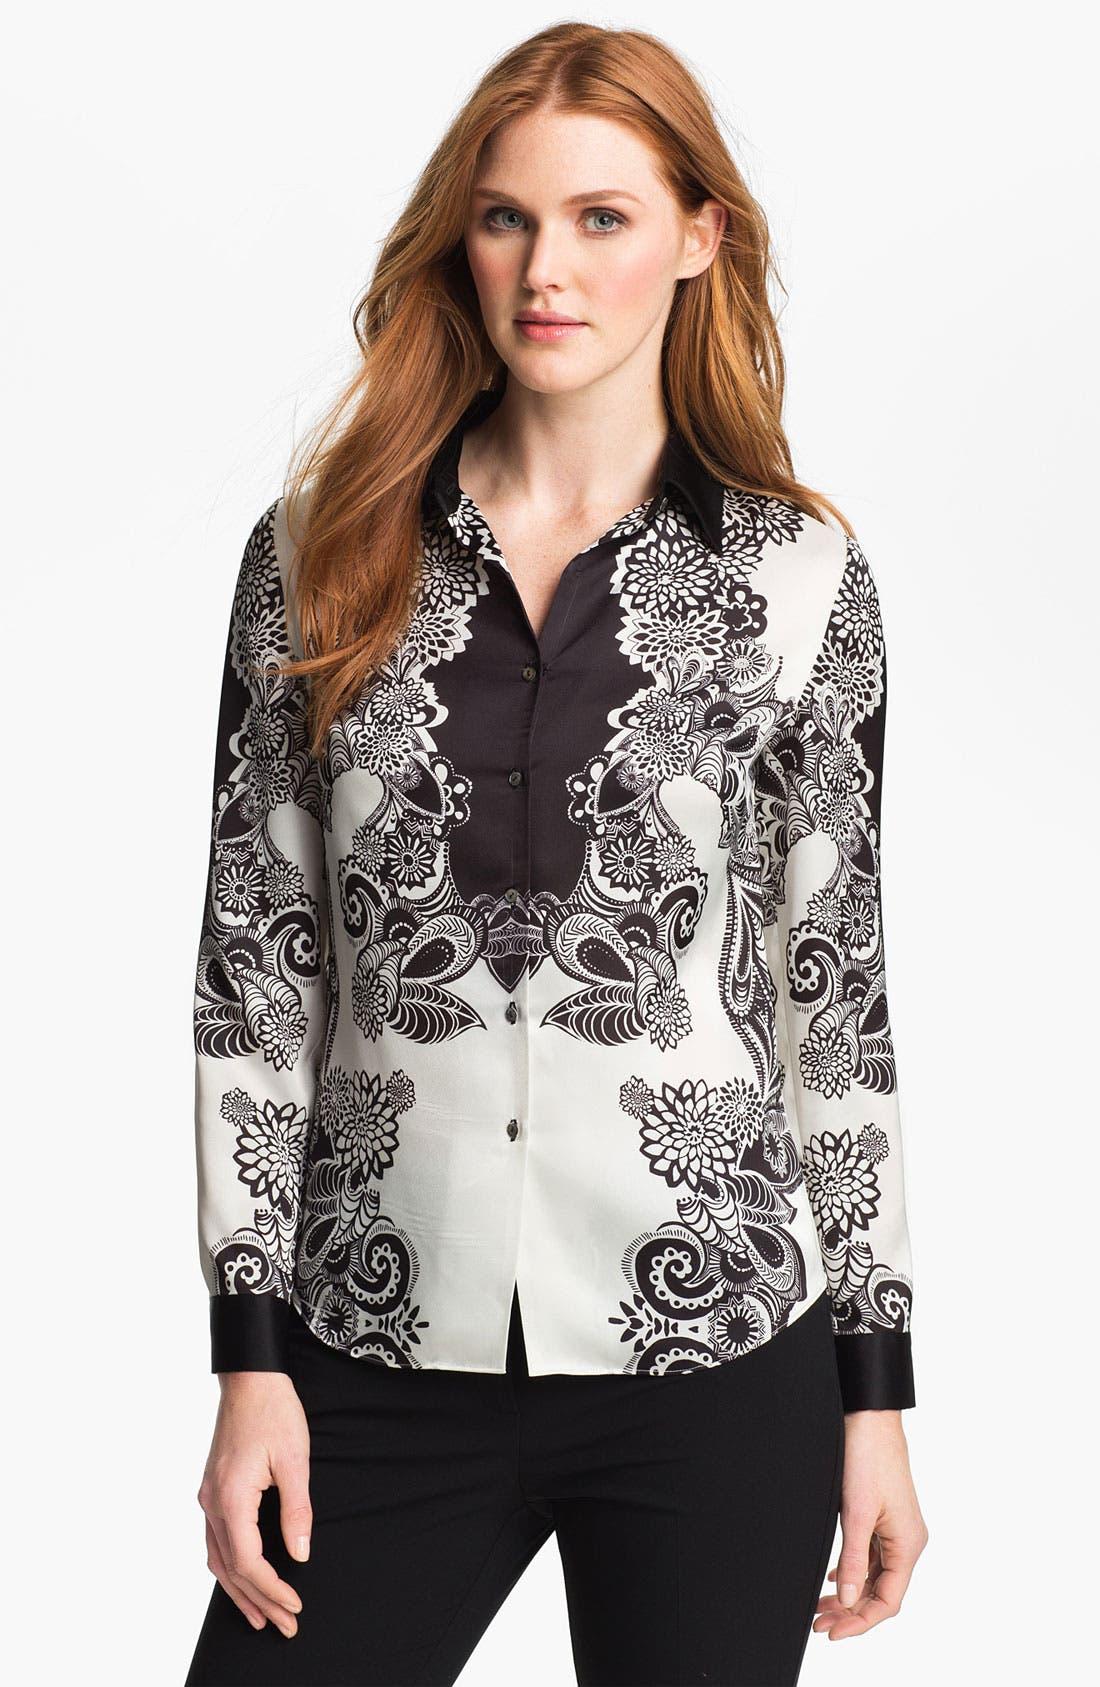 Alternate Image 1 Selected - Adrianna Papell 'Engineered Print' Shirt